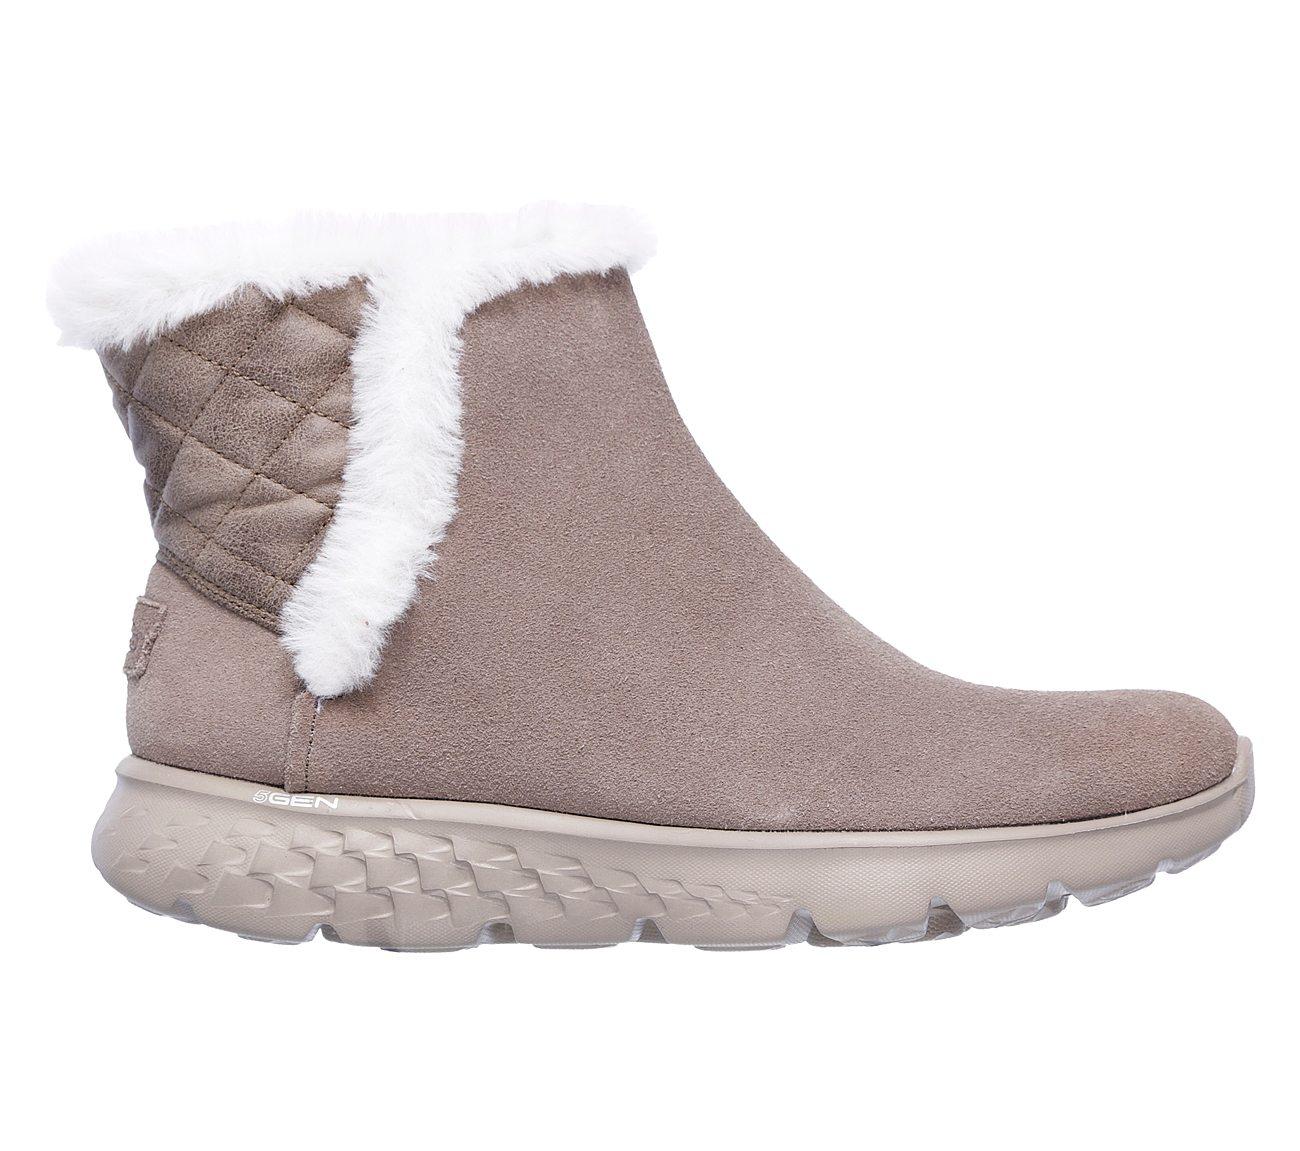 skechers performance women's on the go 400 cozies winter boot